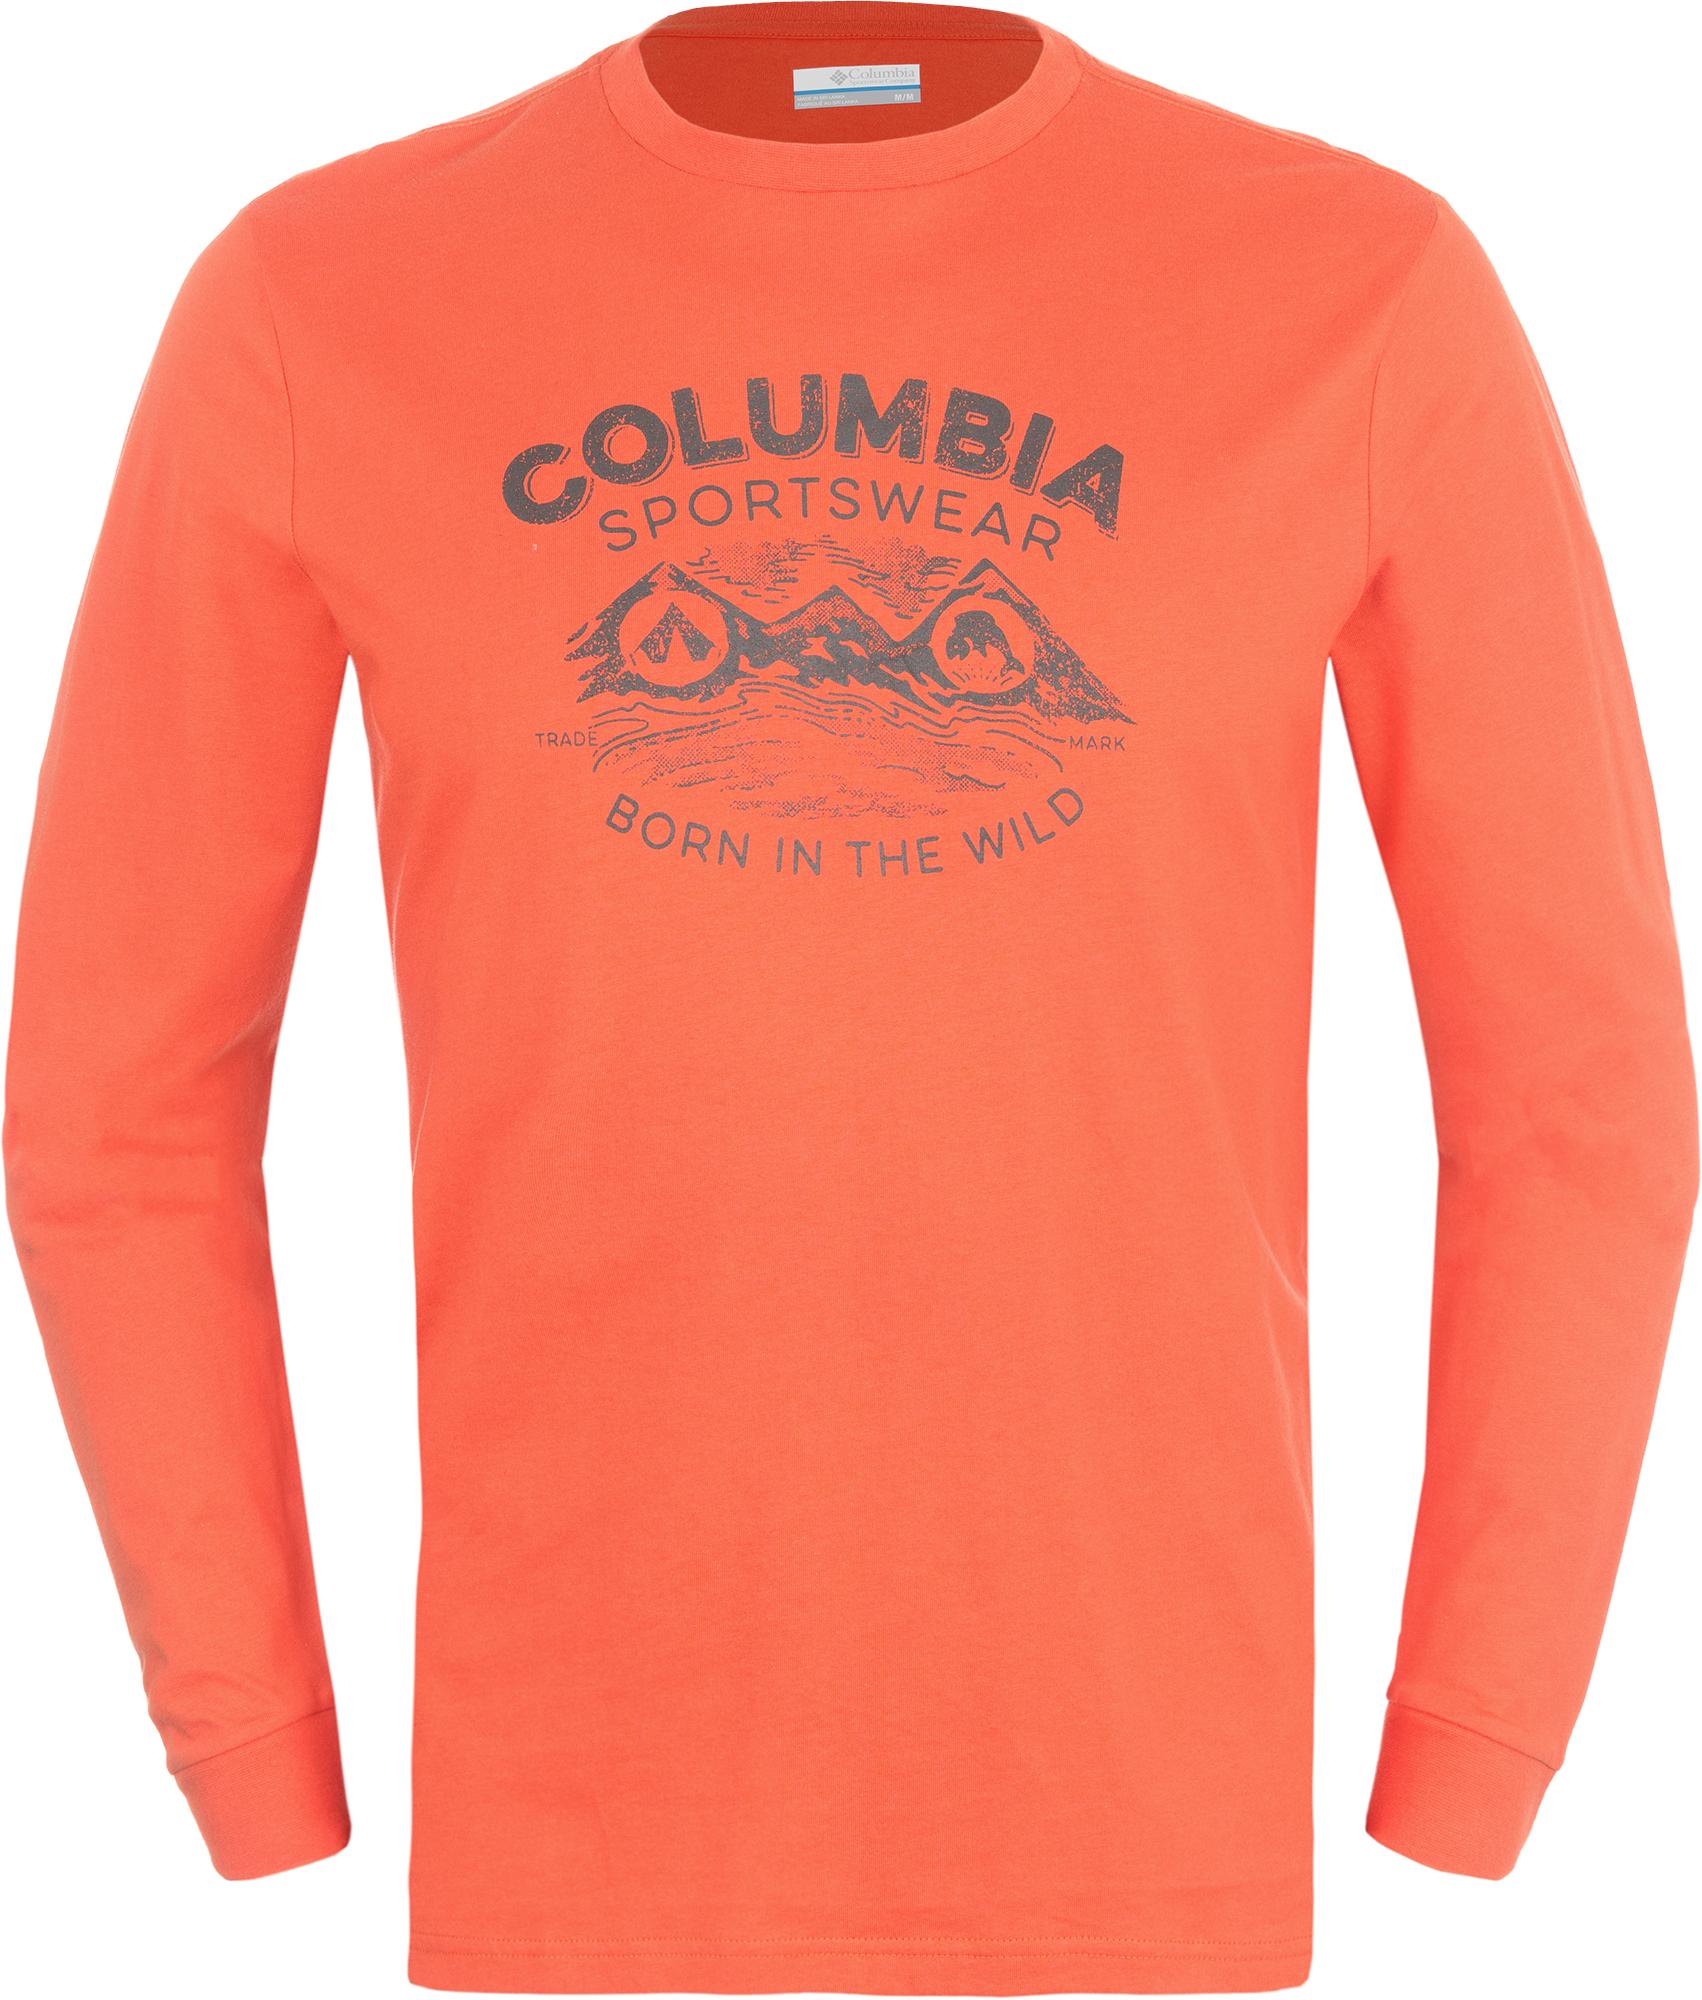 Columbia Футболка с длинным рукавом мужская Columbia Born In The Wild